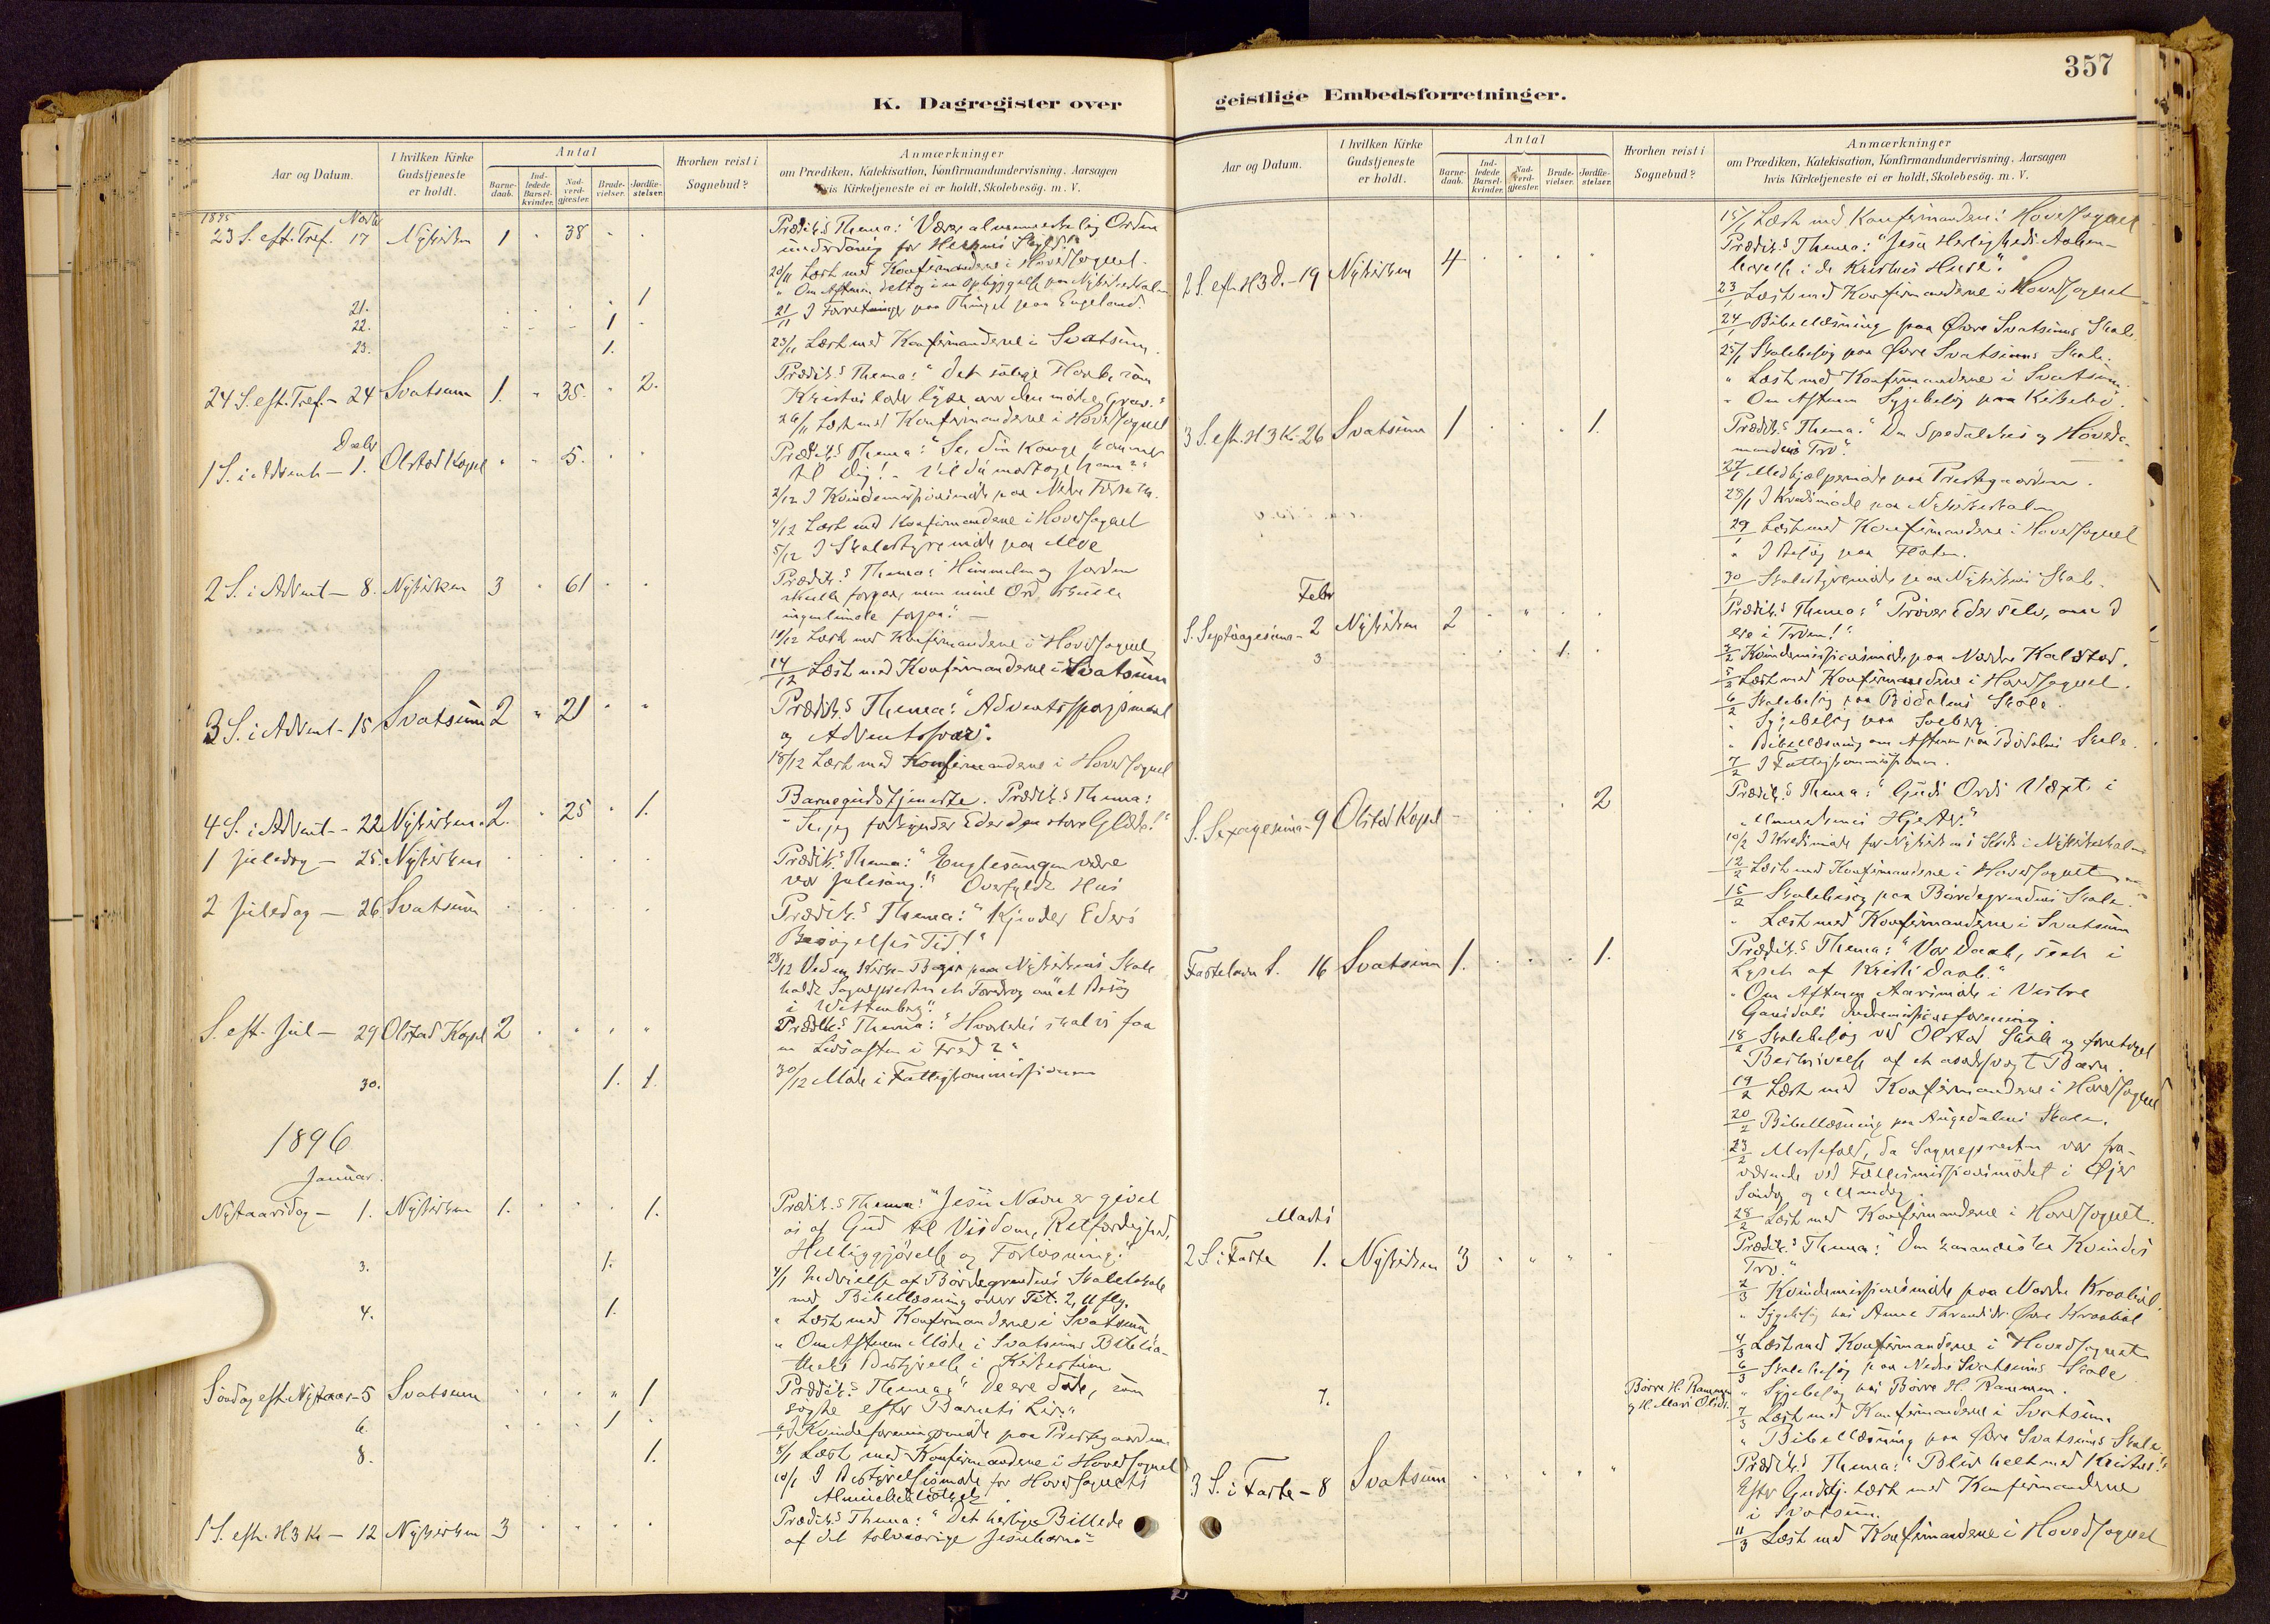 SAH, Vestre Gausdal prestekontor, Ministerialbok nr. 1, 1887-1914, s. 357